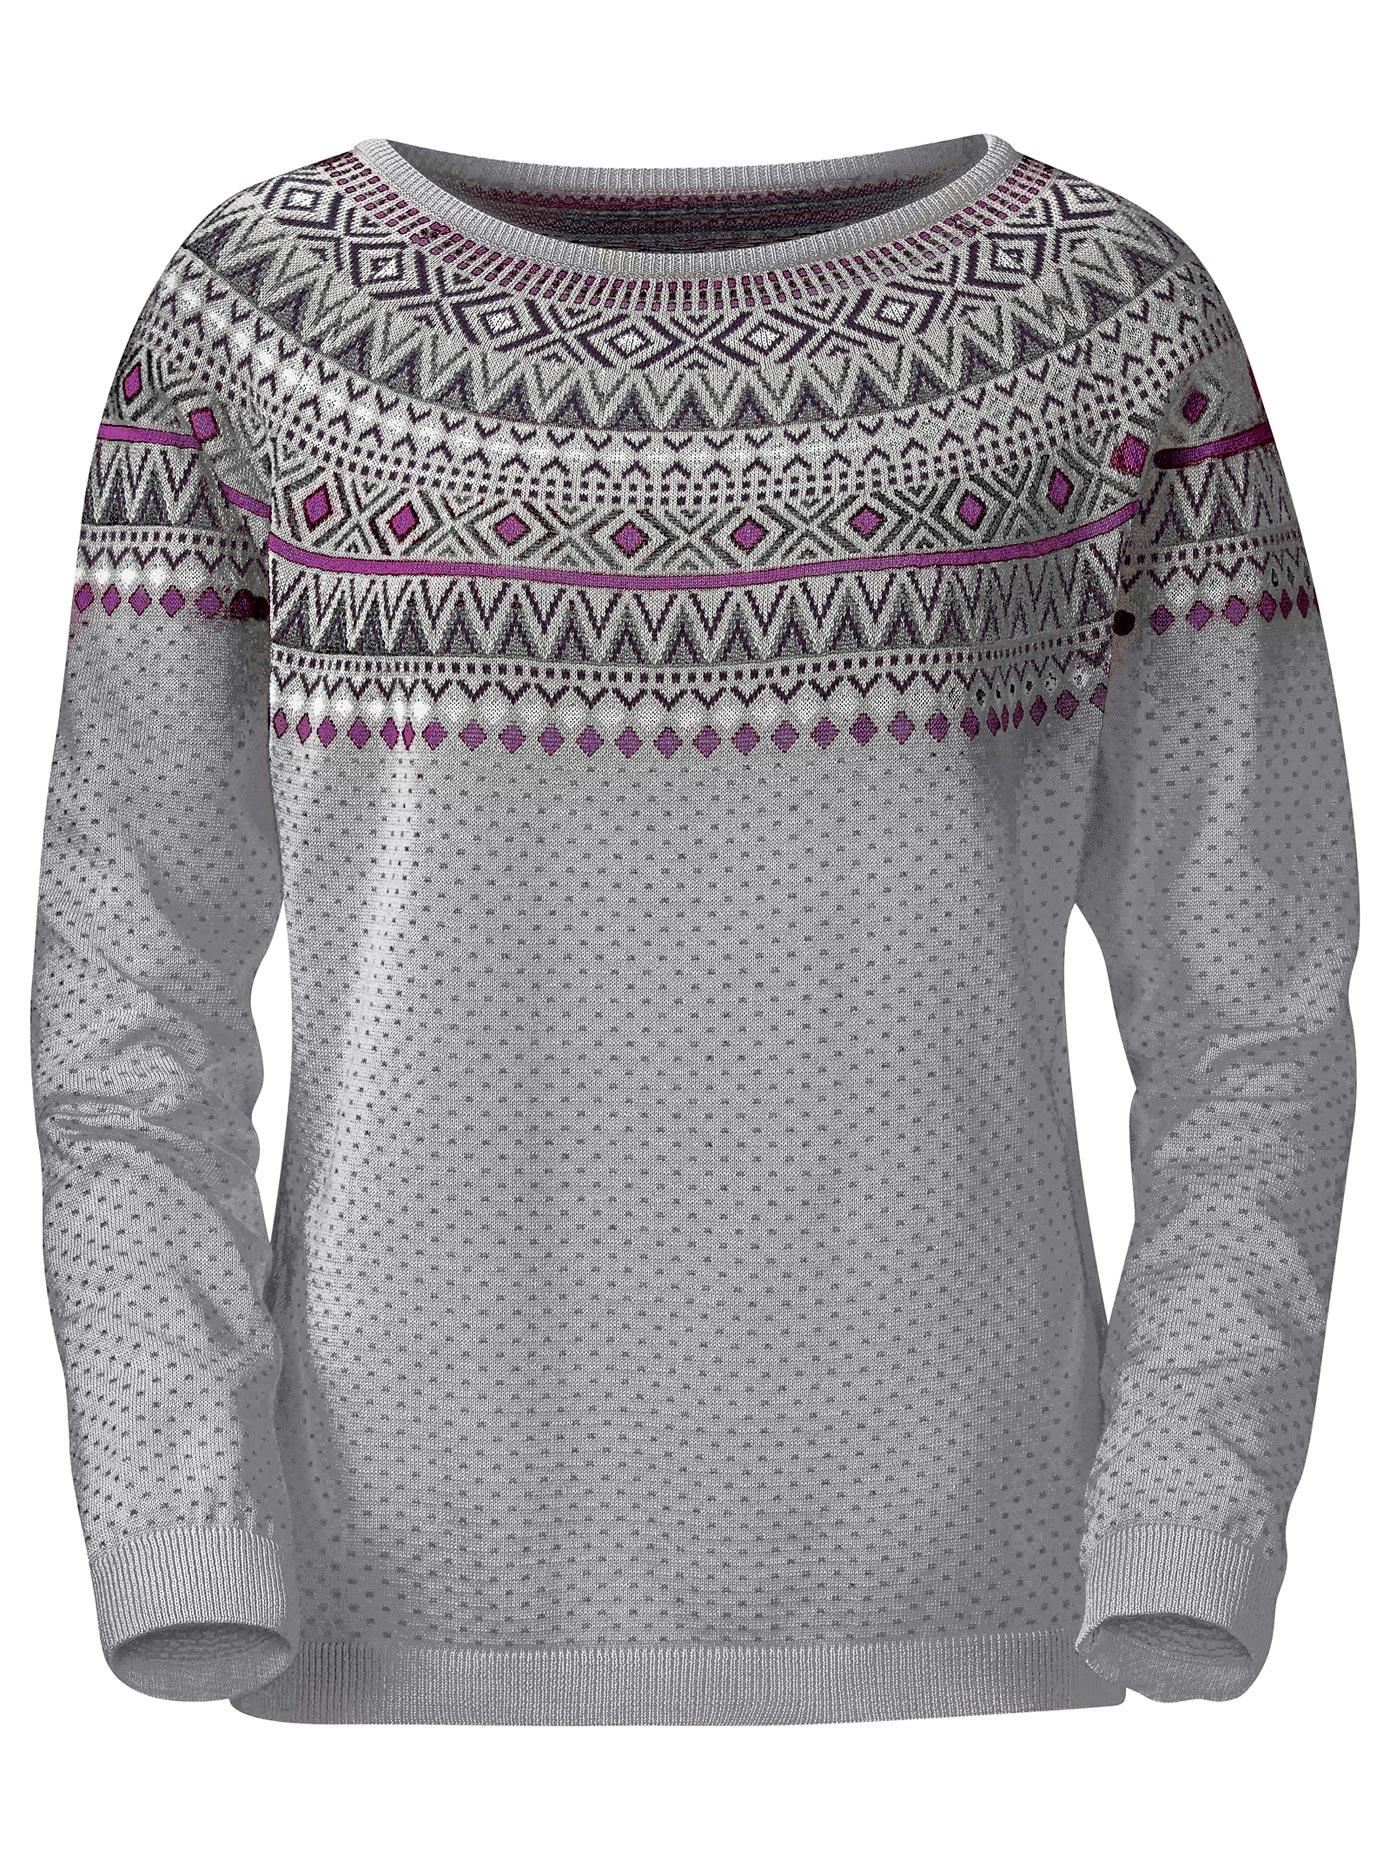 Inspirationen Norwegerpullover Pullover günstig online kaufen